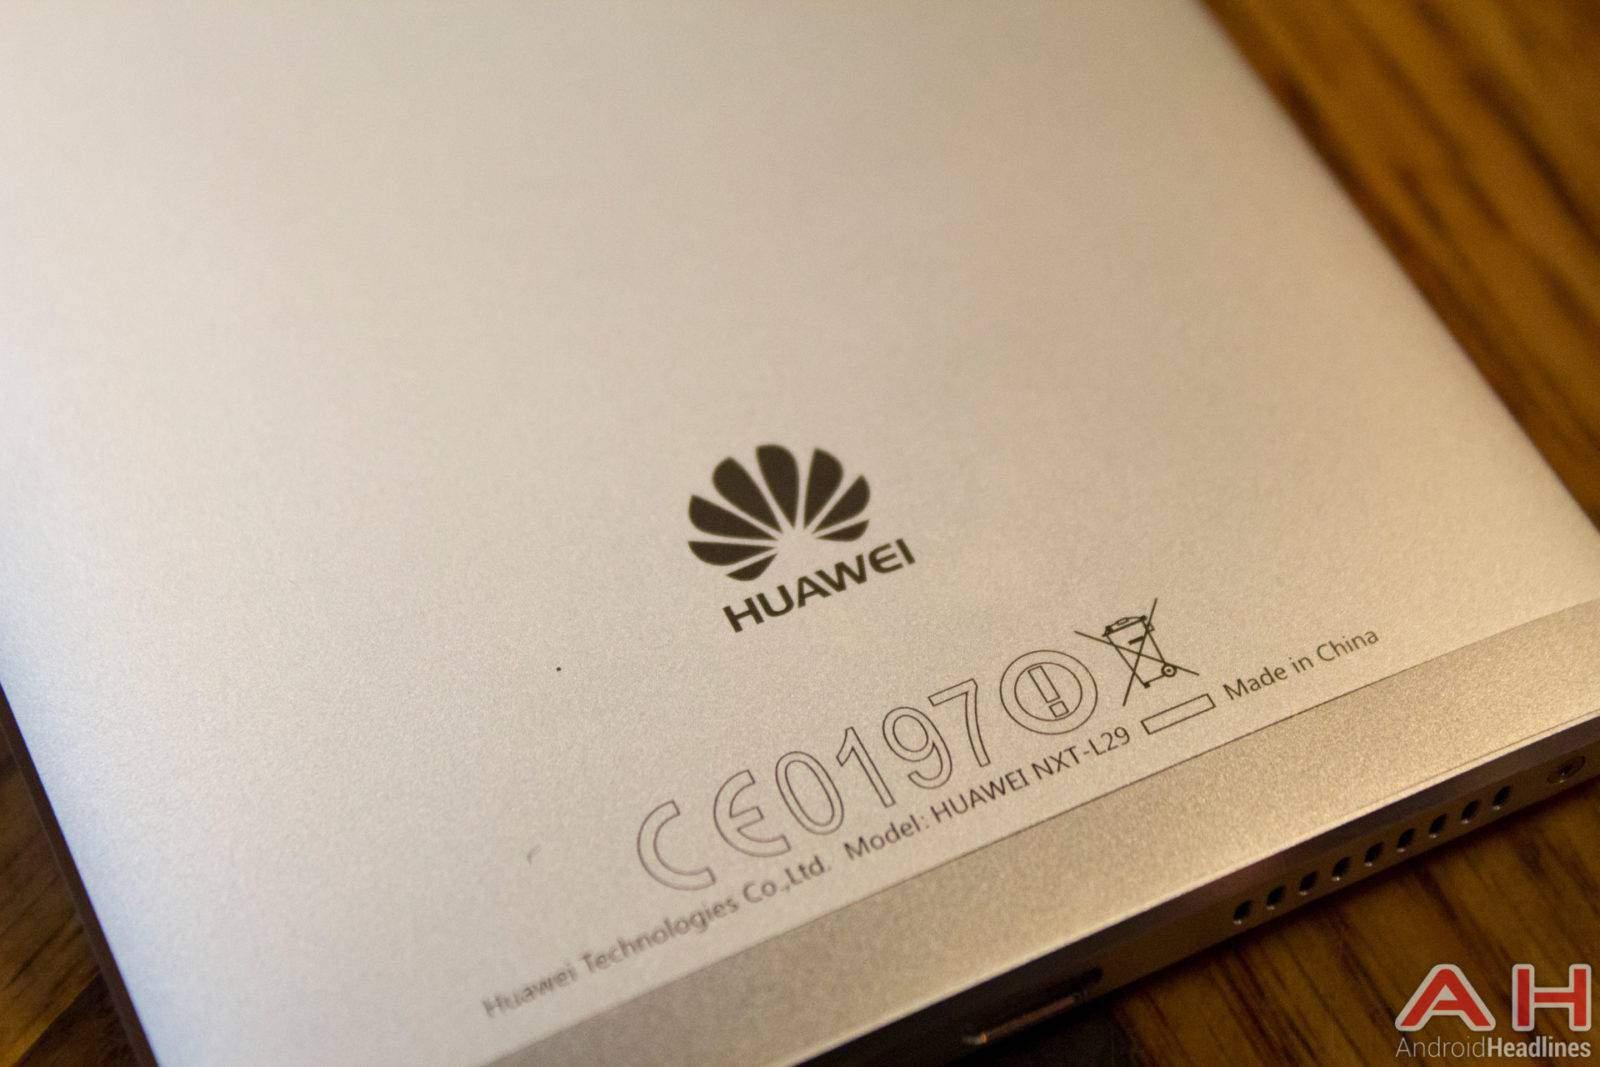 Huawei Mate 8 CES 2016 AH 13